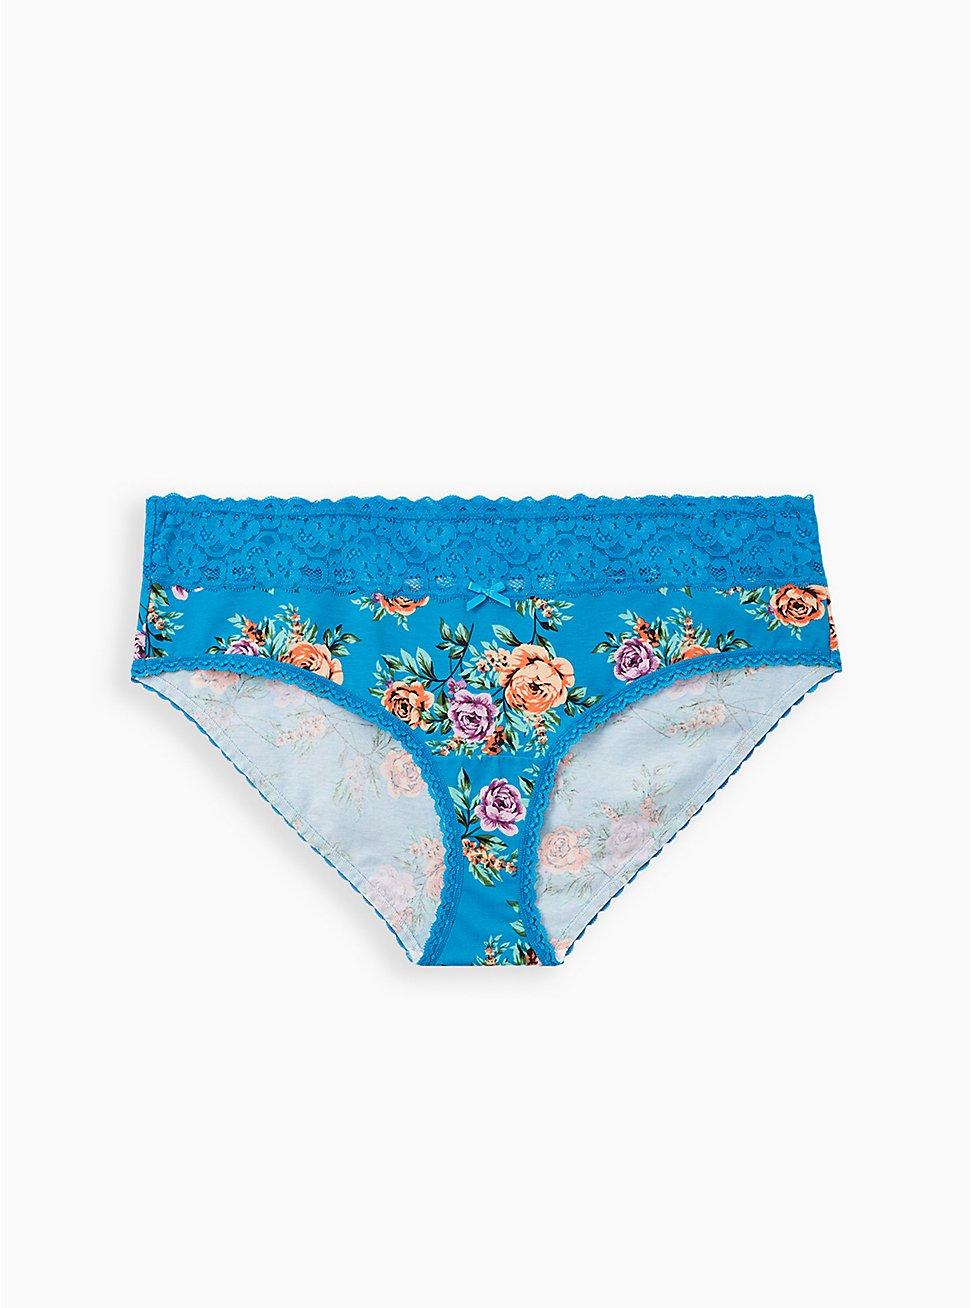 Sky Blue Floral Wide Lace Cotton Hipster Panty, Sky Floral - BLUE, hi-res